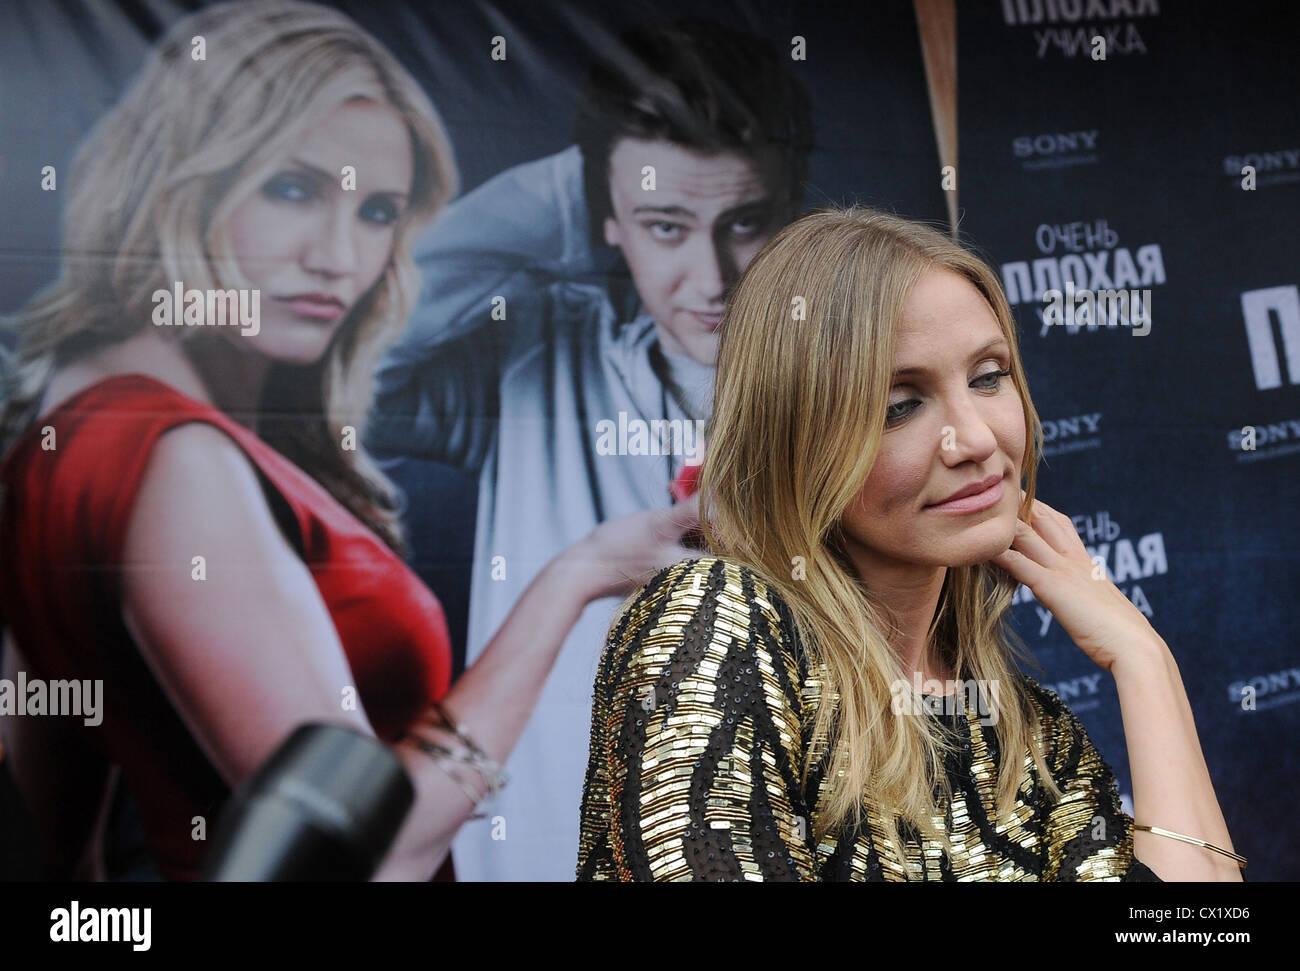 Media: Singer Yulia Nachalova was detained by police 10.12.2017 18